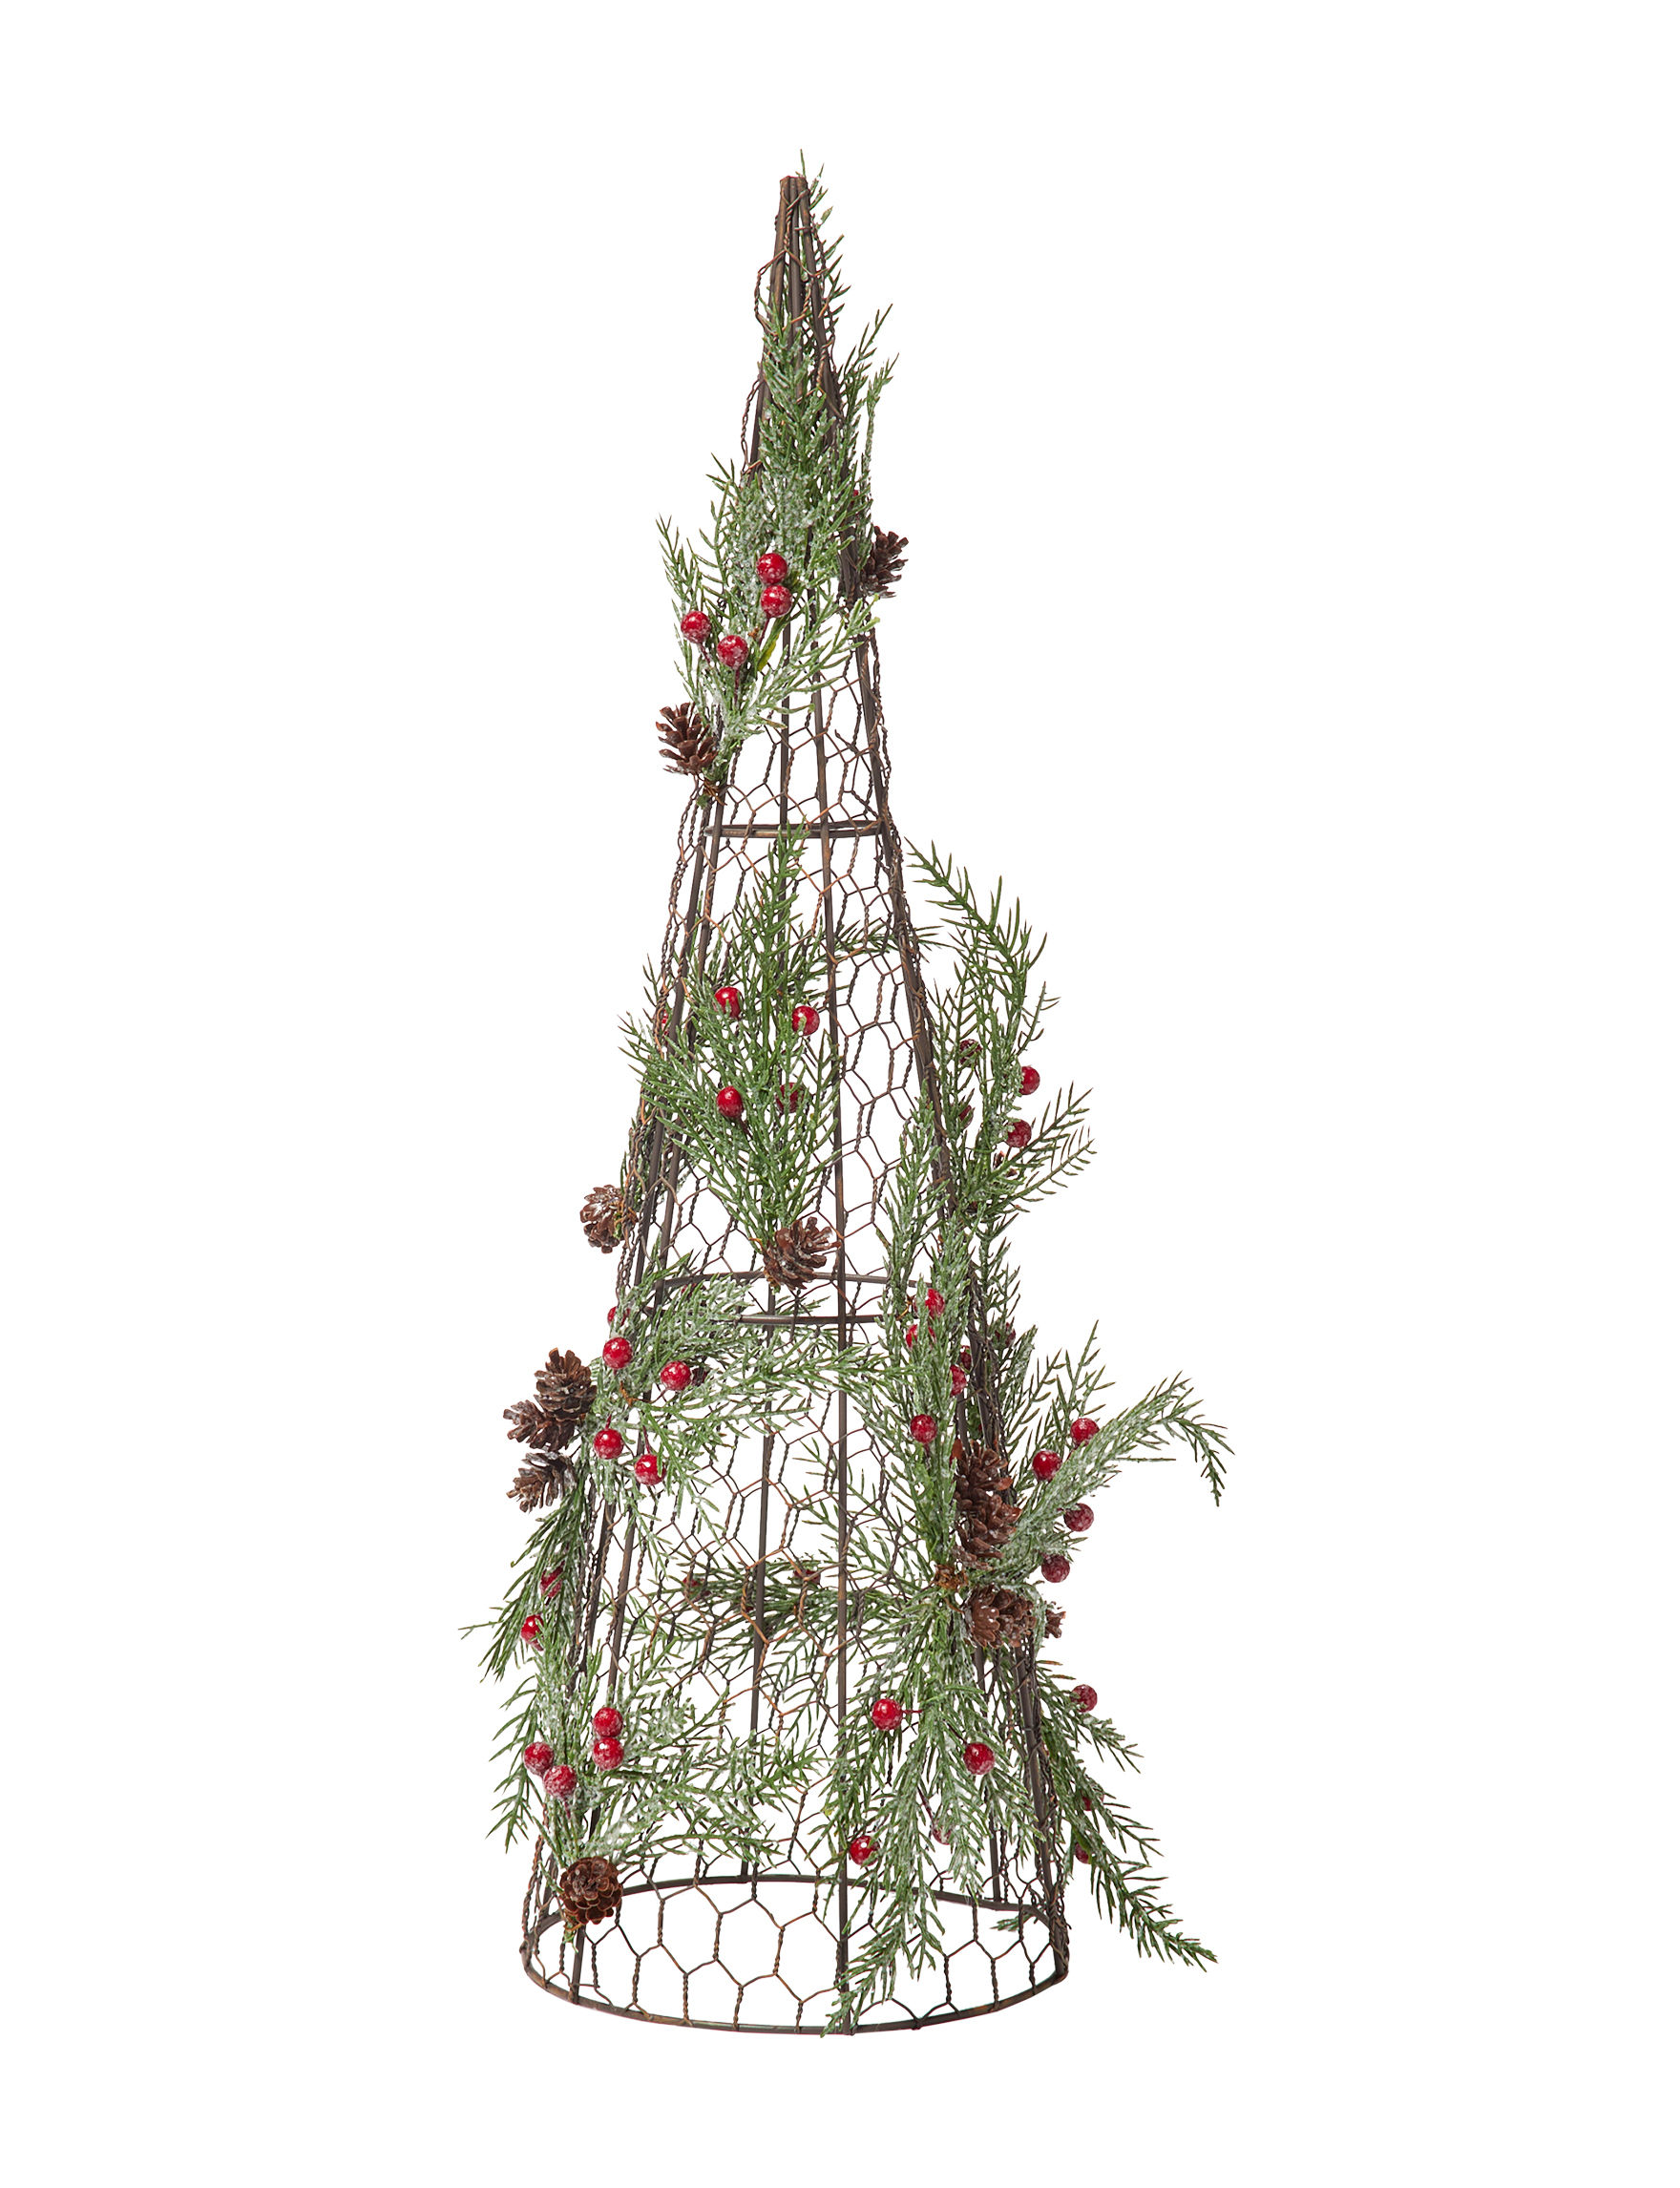 Jingle Bell Lane Green Decorative Objects Holiday Decor